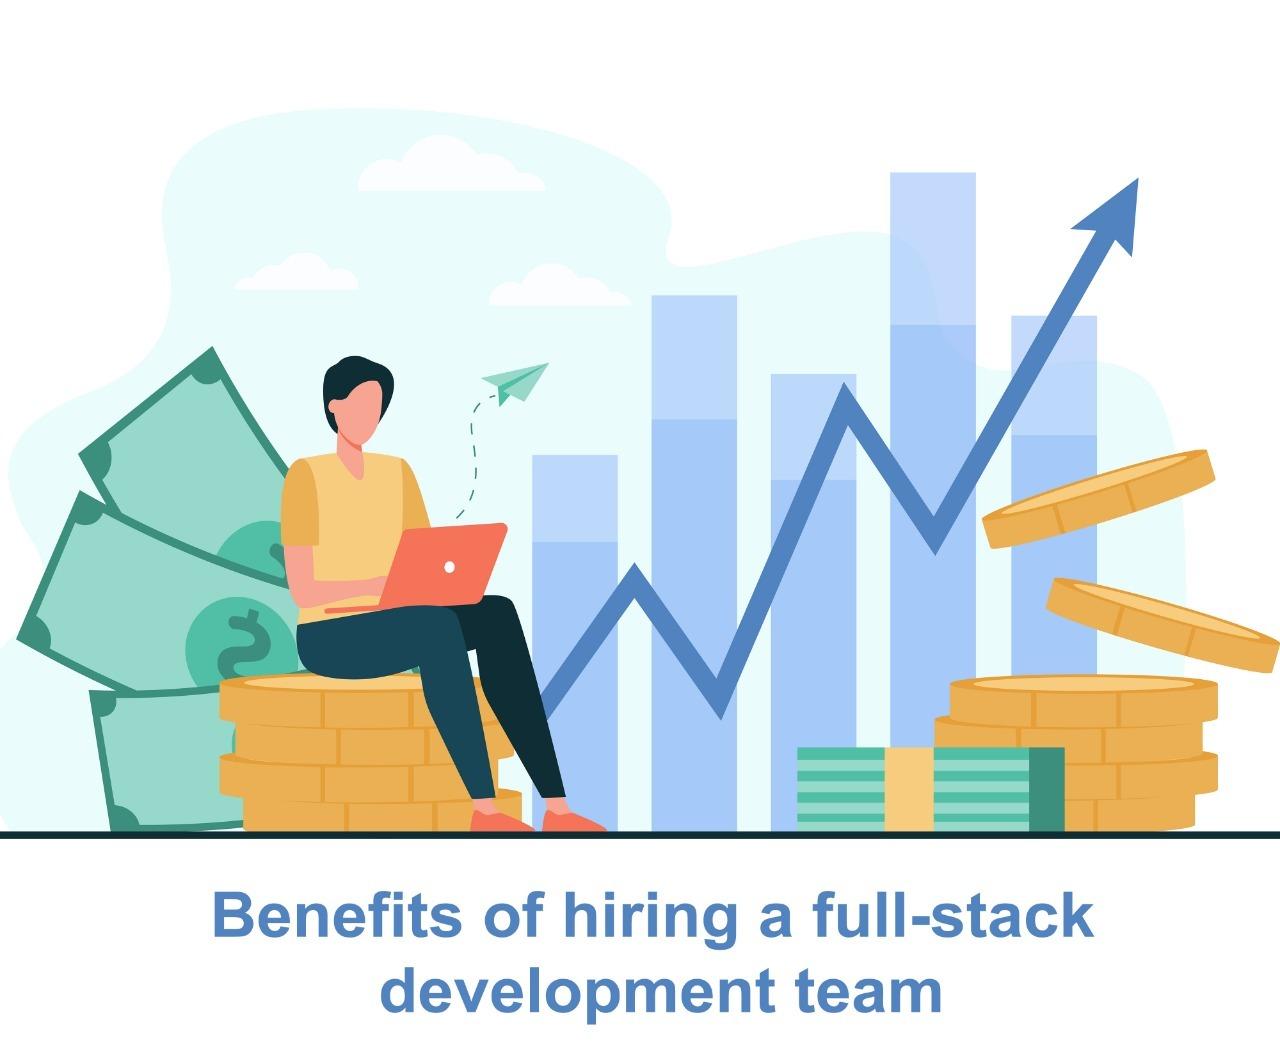 Benefits of hiring a full stack development team